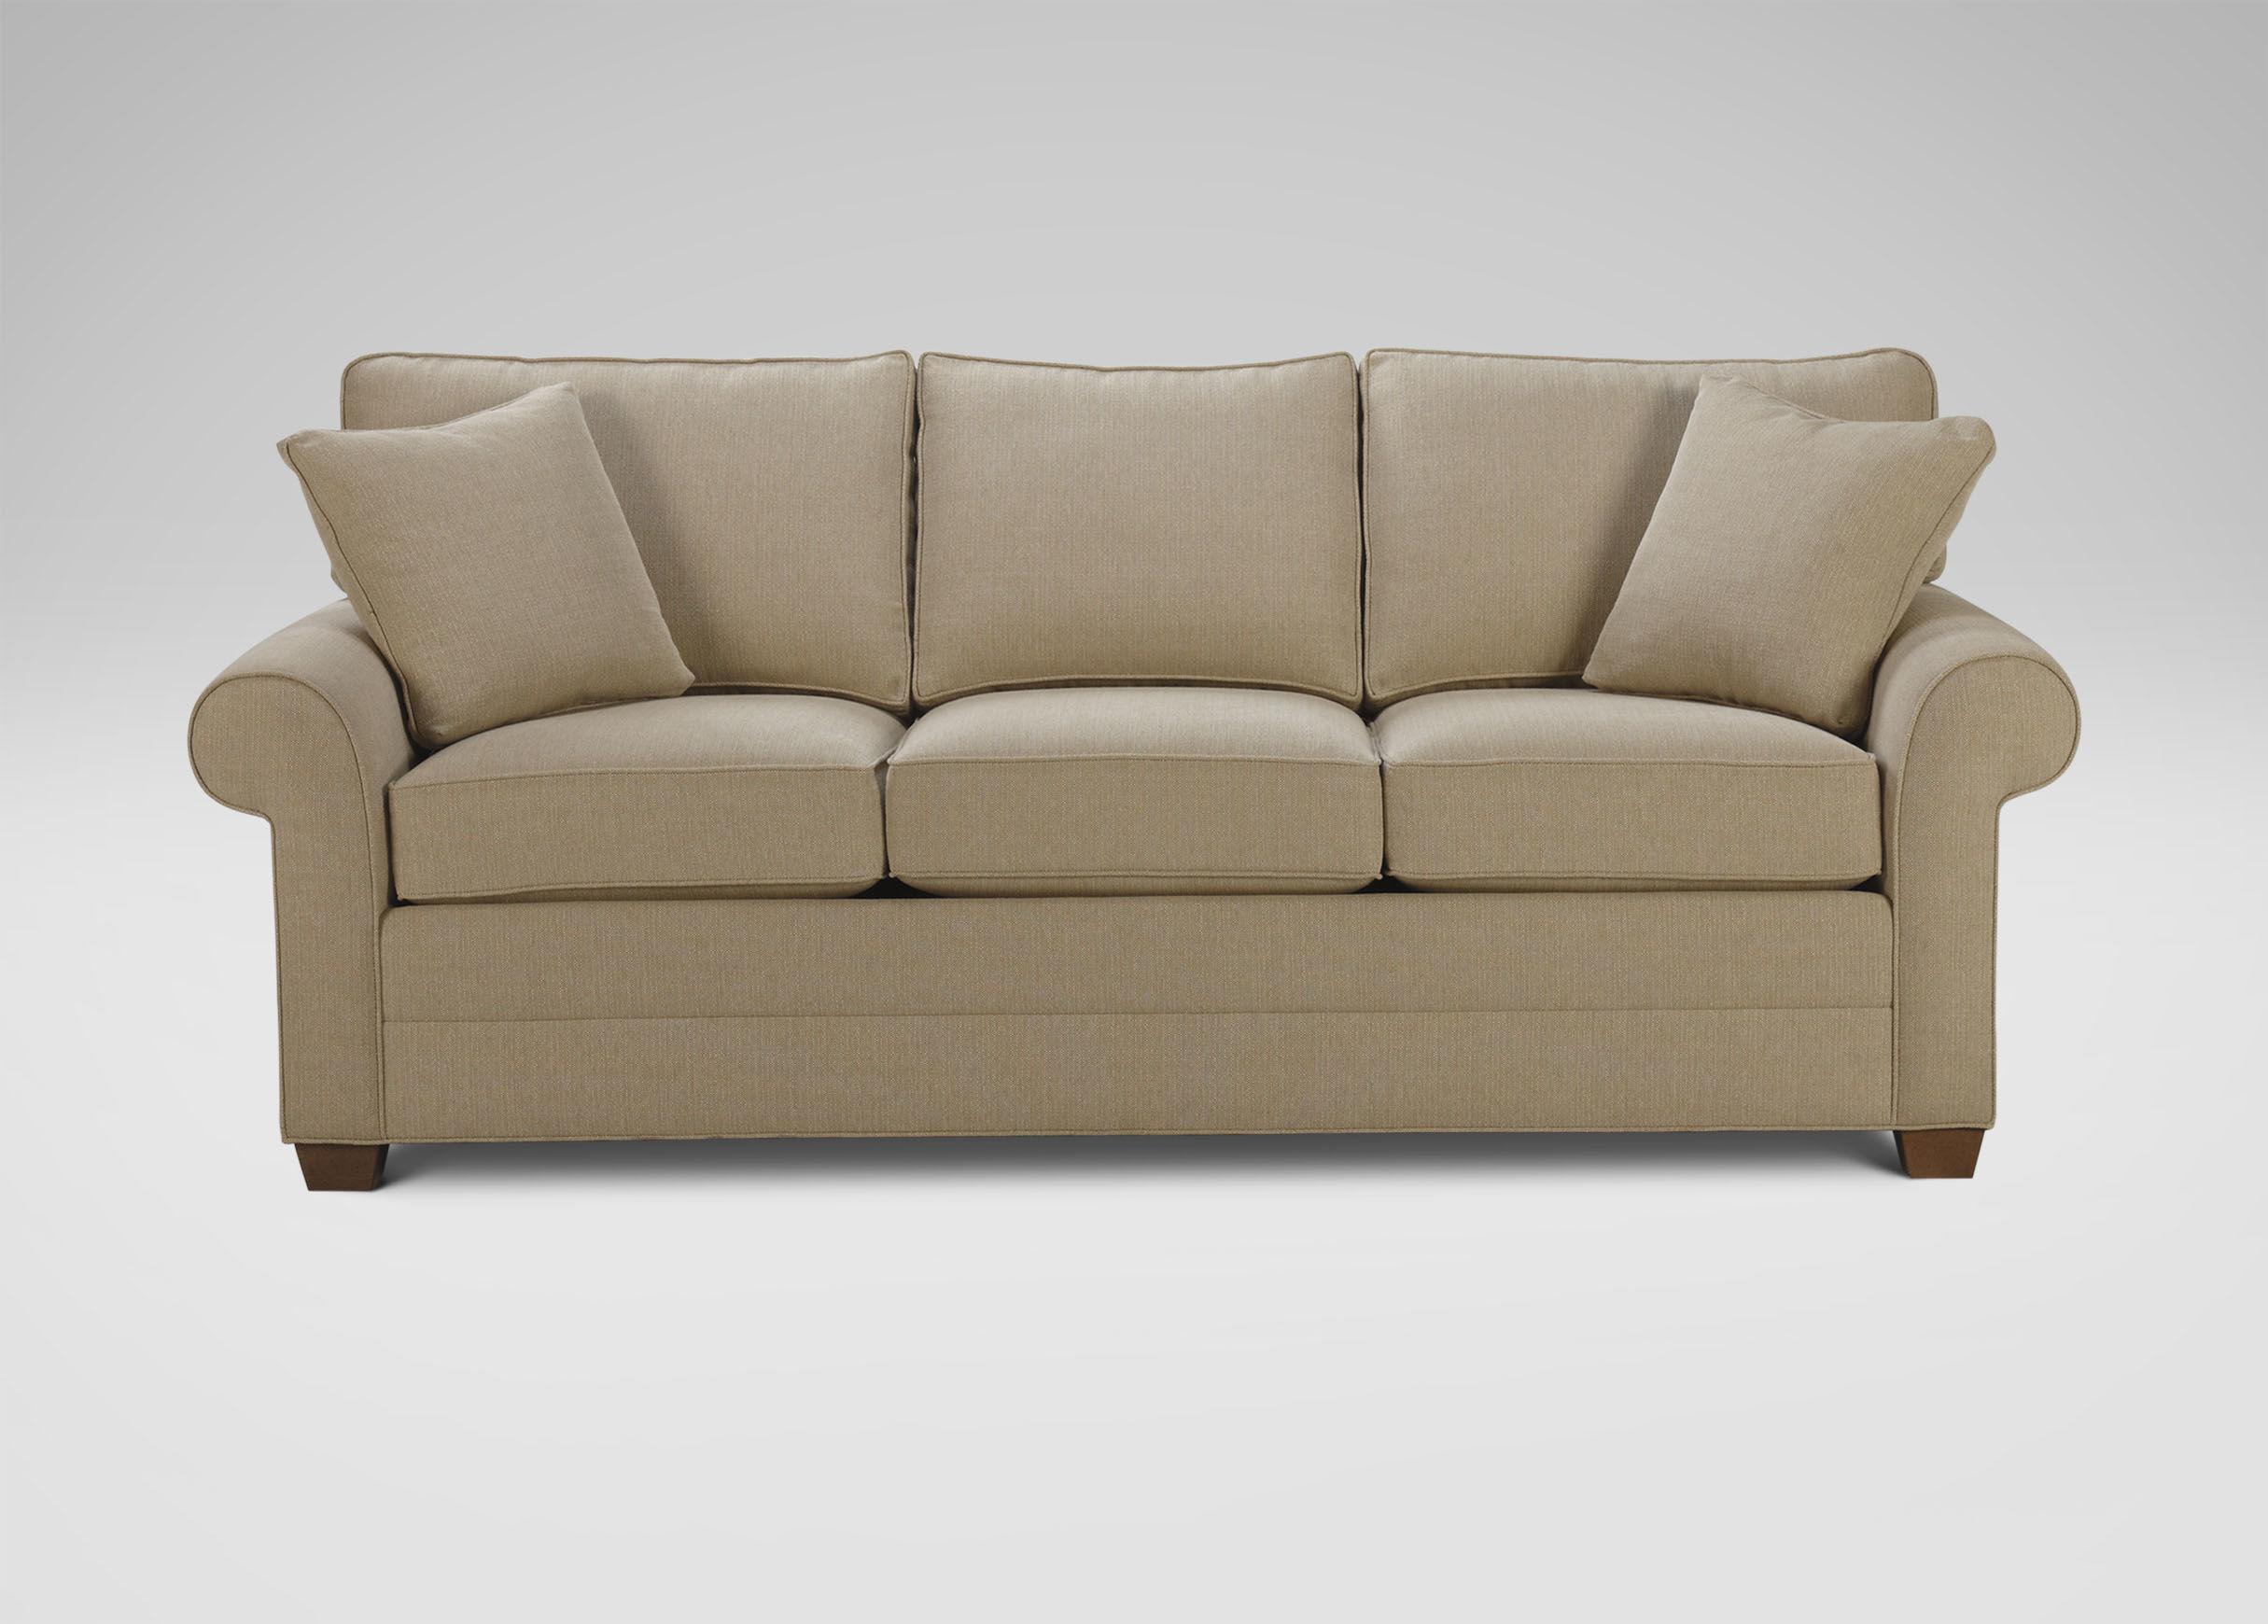 ethan allen sectional sleeper sofa small leather sleepers amusing